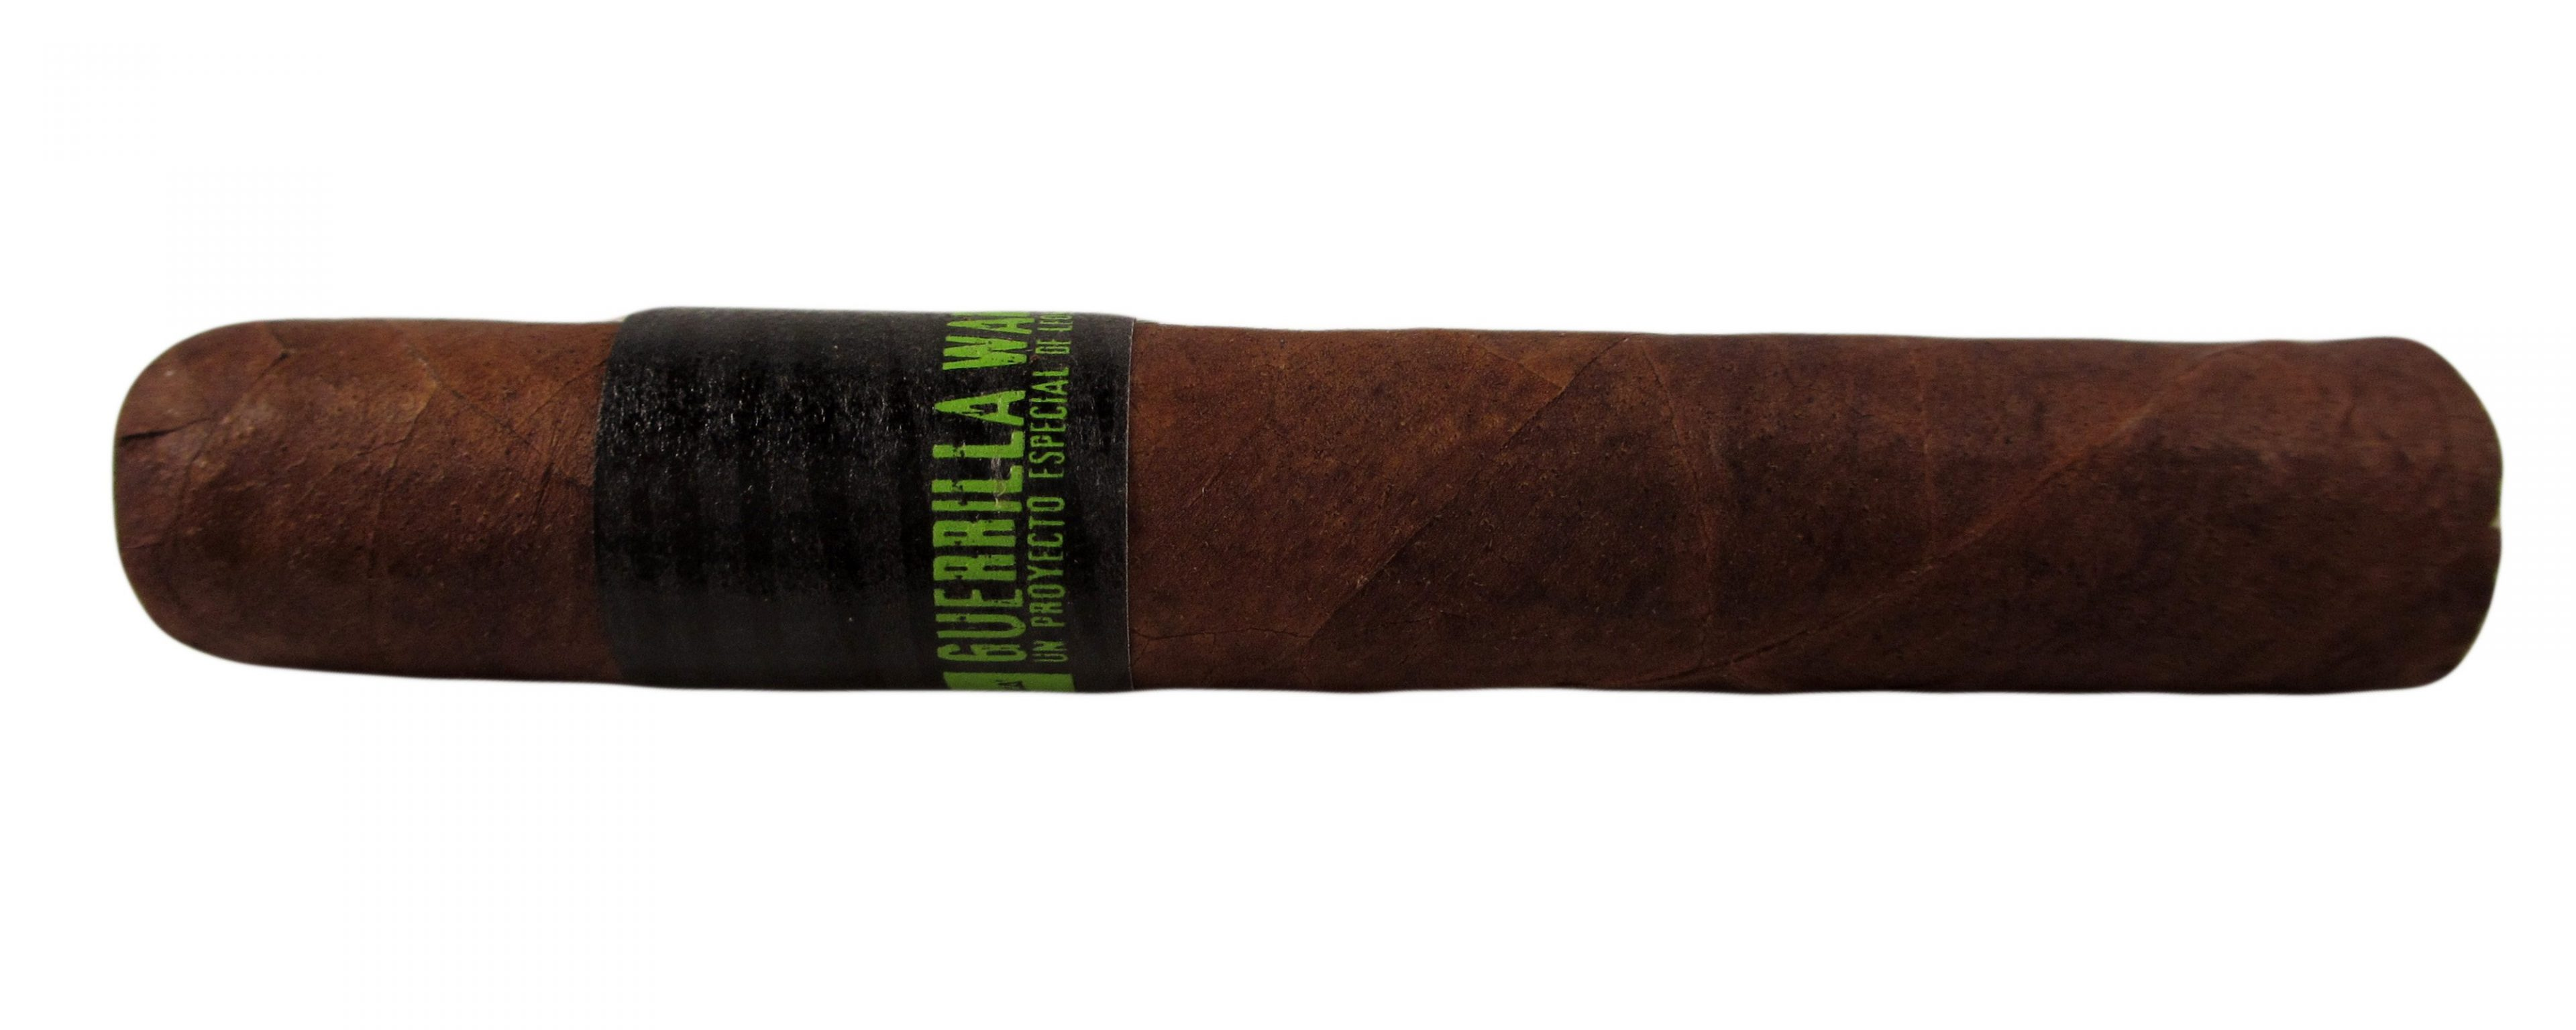 Blind Cigar Review: Viva Republica | Guerrilla Warfare Petit Corona